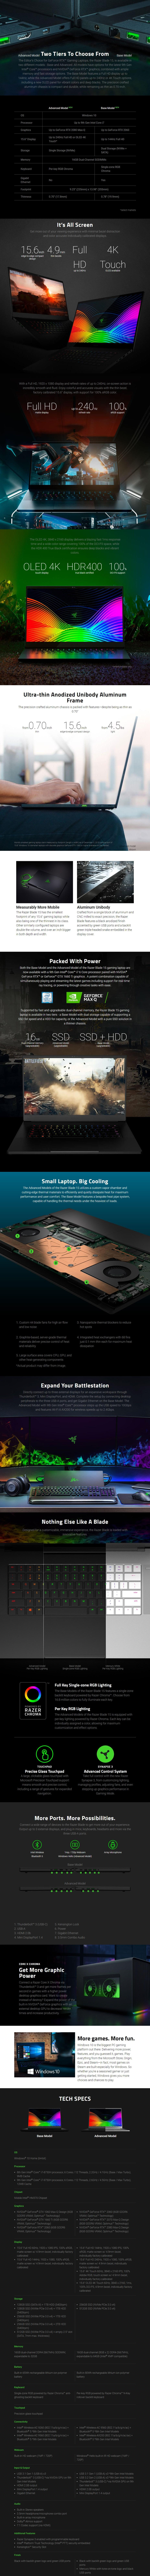 razer-blade-156-fhd-gaming-laptop-i79750h-16gb-128gb-1tb-rtx1660-ti-ac27423.jpg